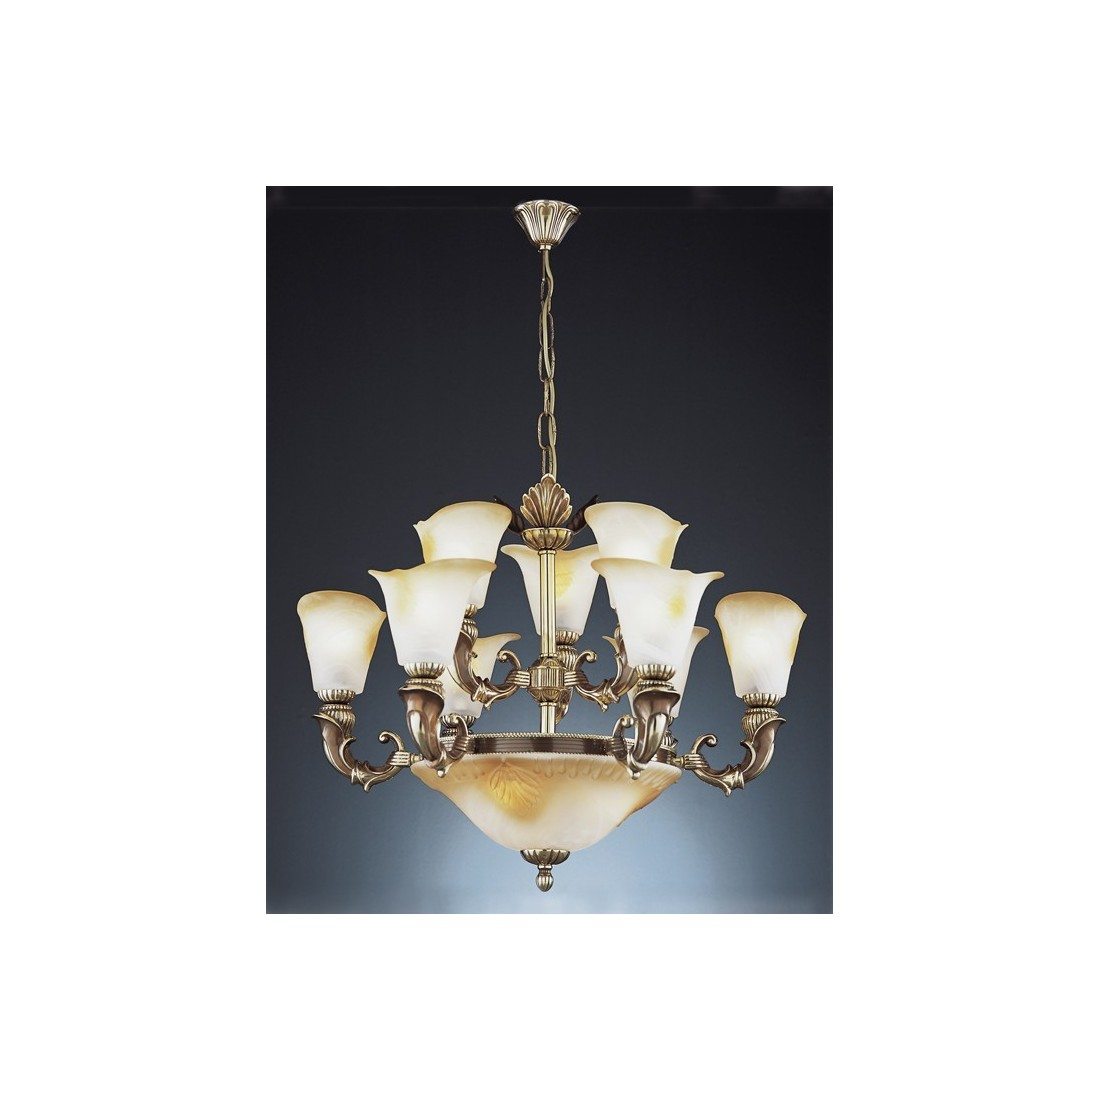 L mpara con tulipas de cristal de murano fabricada en espa a - Tulipas de lamparas ...